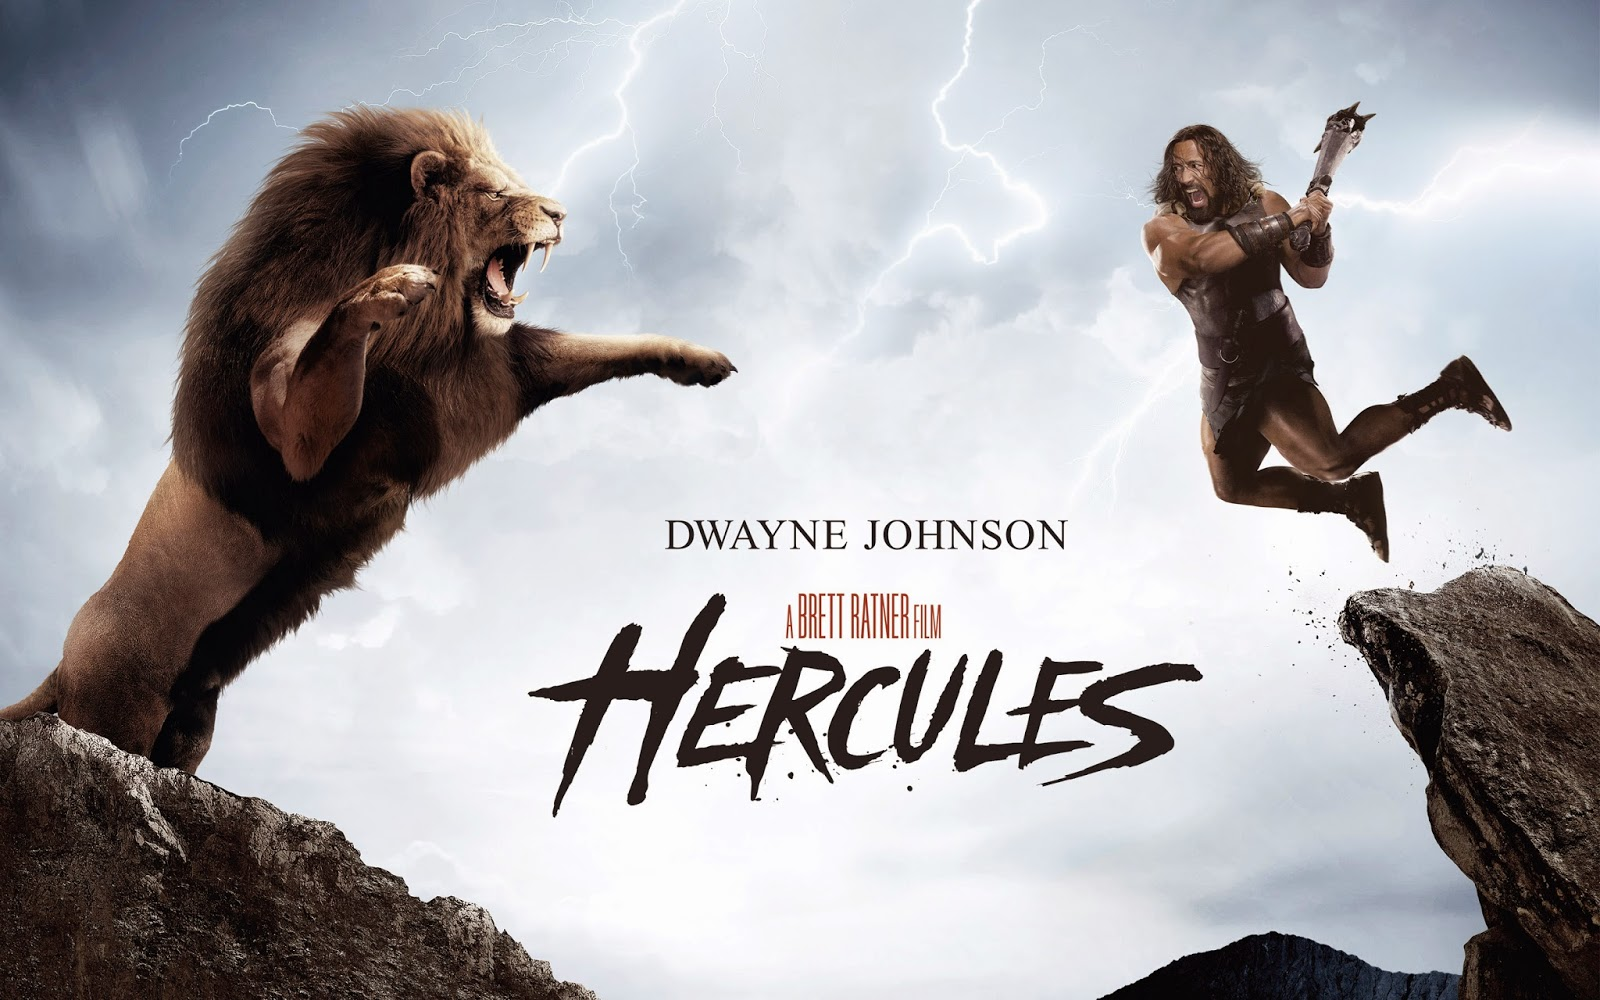 Screening Notes: Deconstructing Mythology in The Rock's Hercules